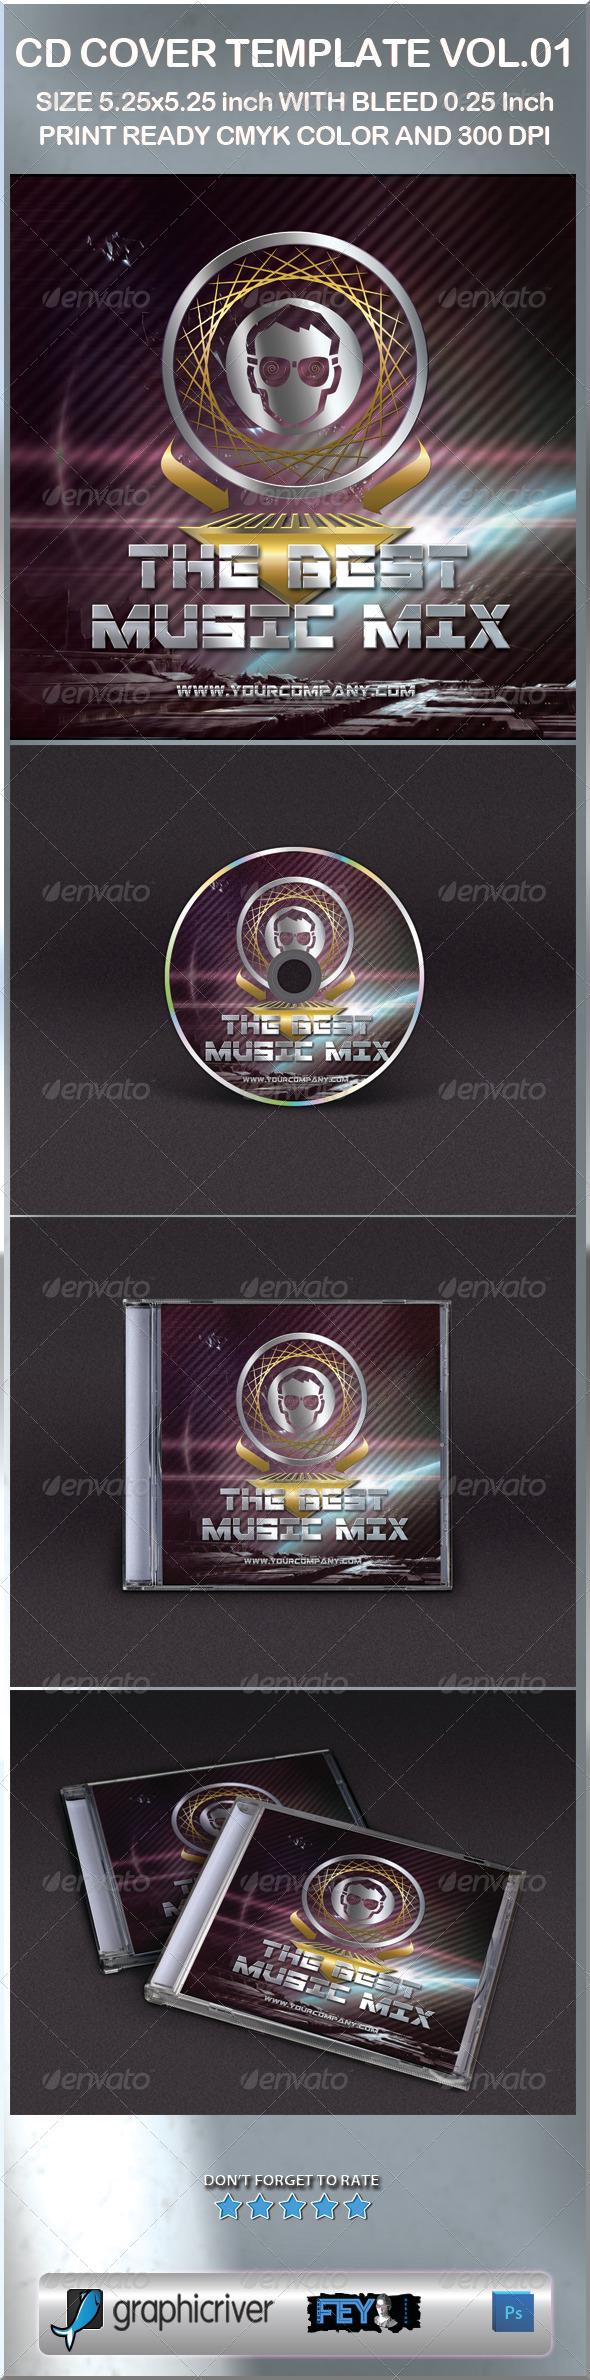 GraphicRiver CD Cover Template Vol.01 5996602